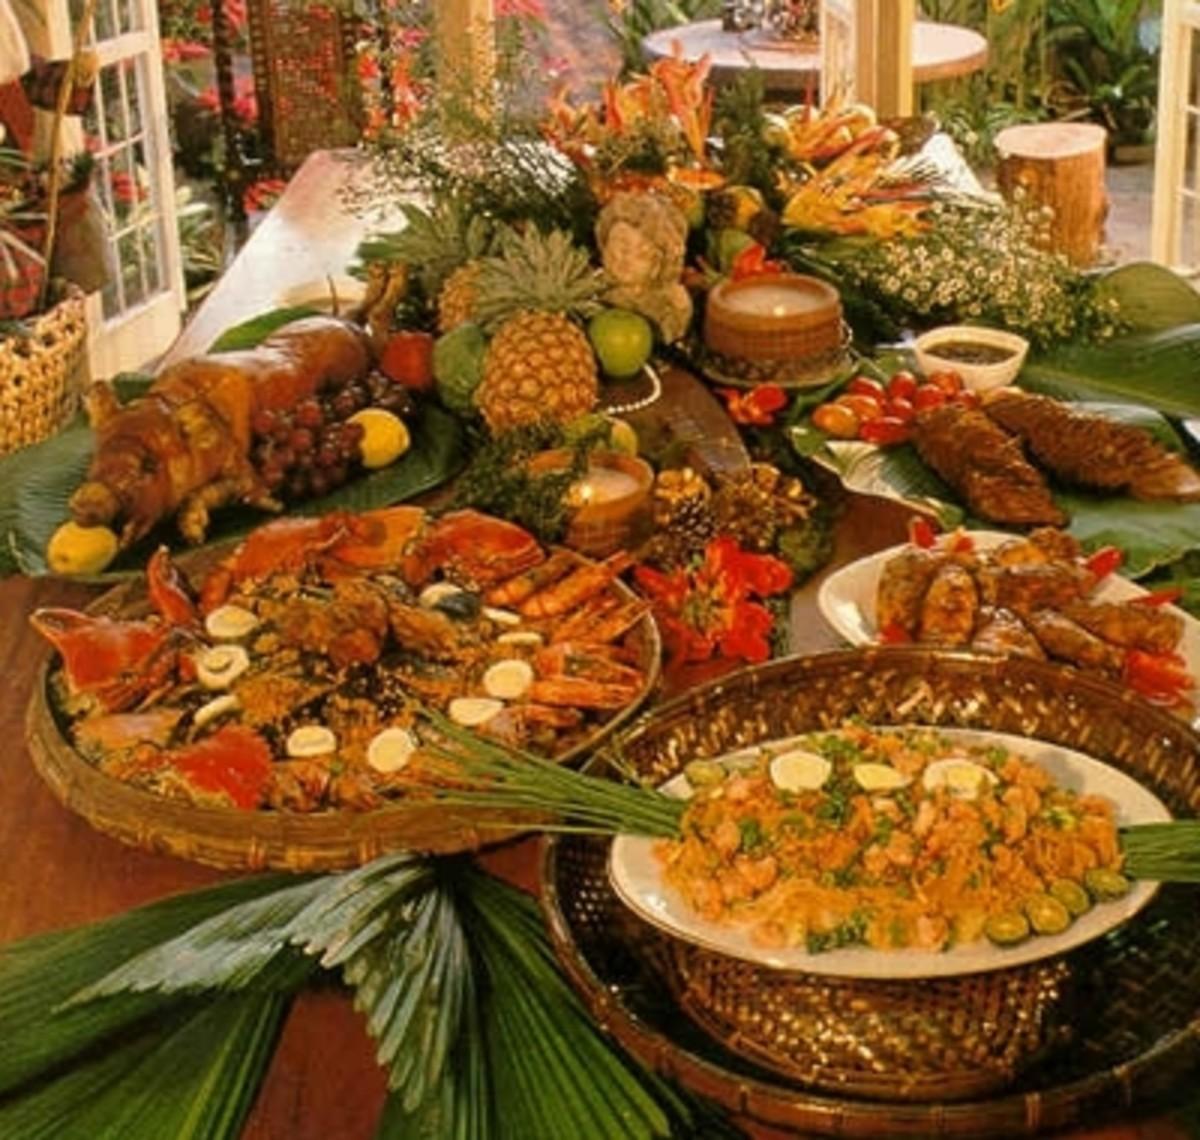 Filipino christmas recipes traditional and authentic filipino christmas recipes forumfinder Gallery